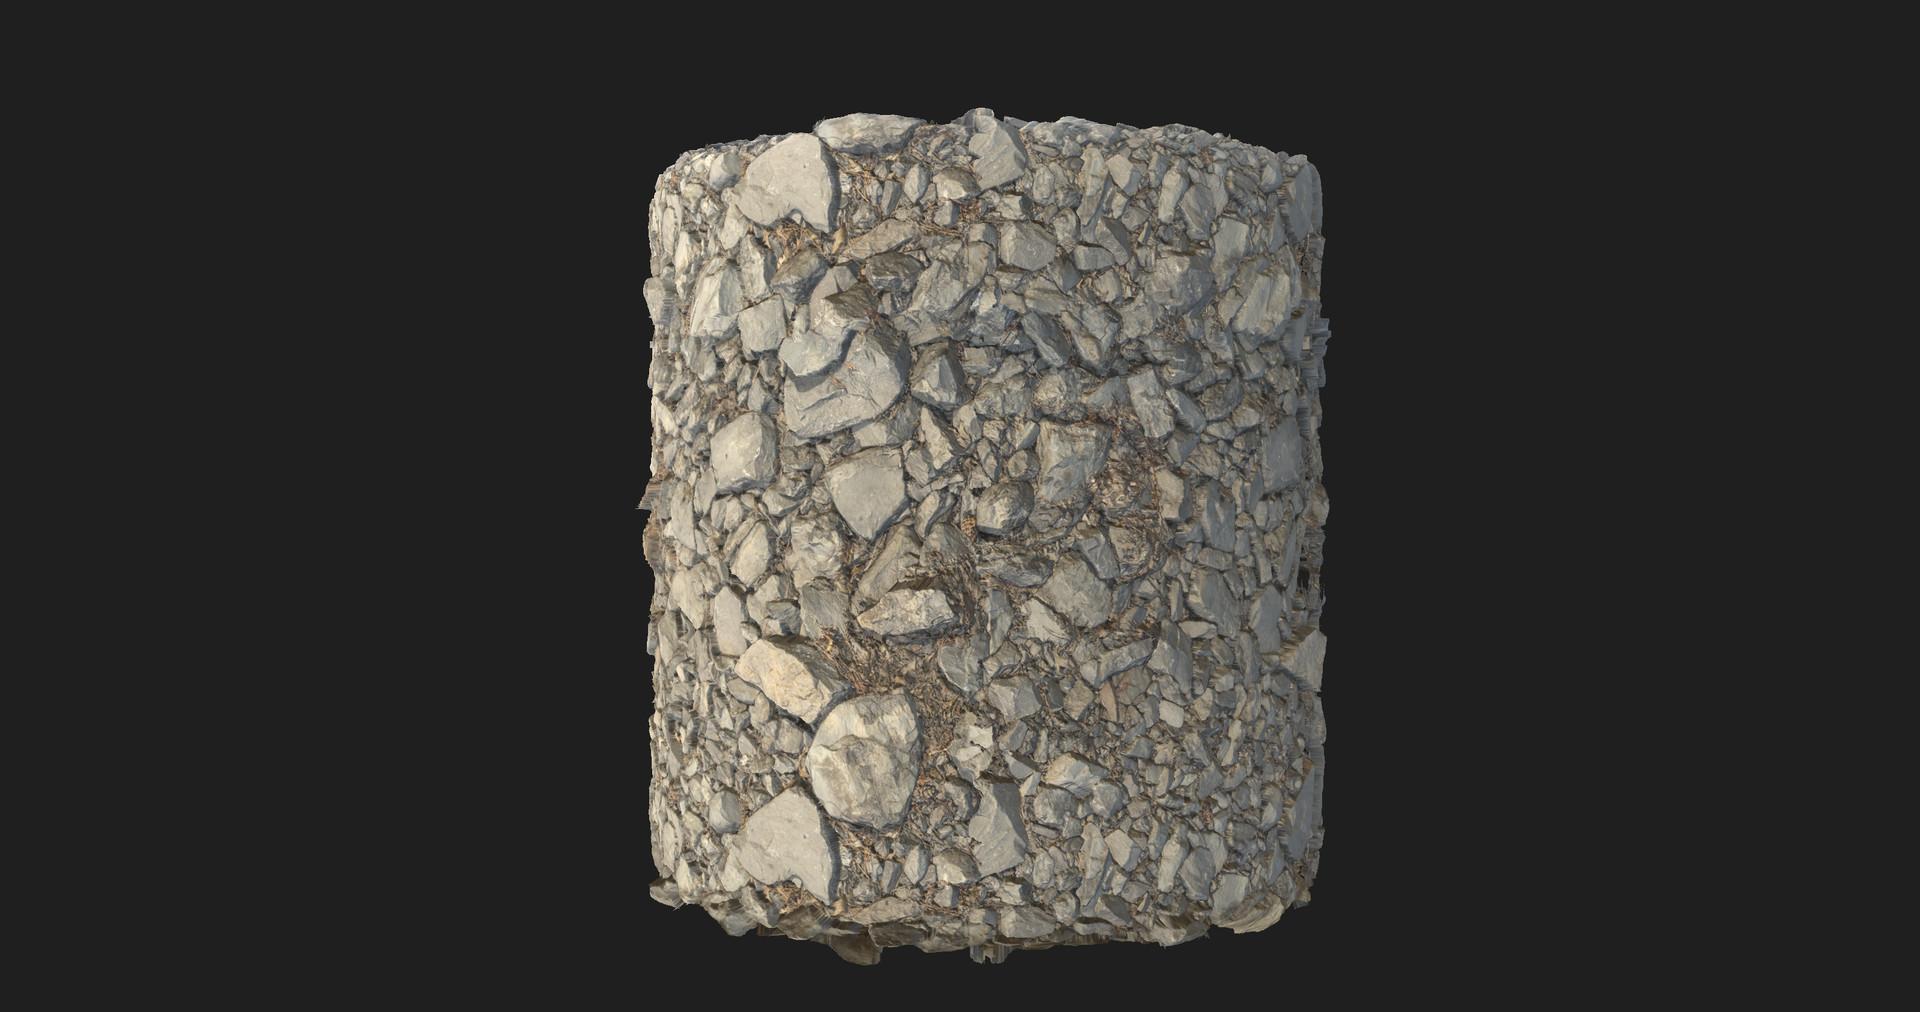 Martin pietras martin pietras rock rend 1